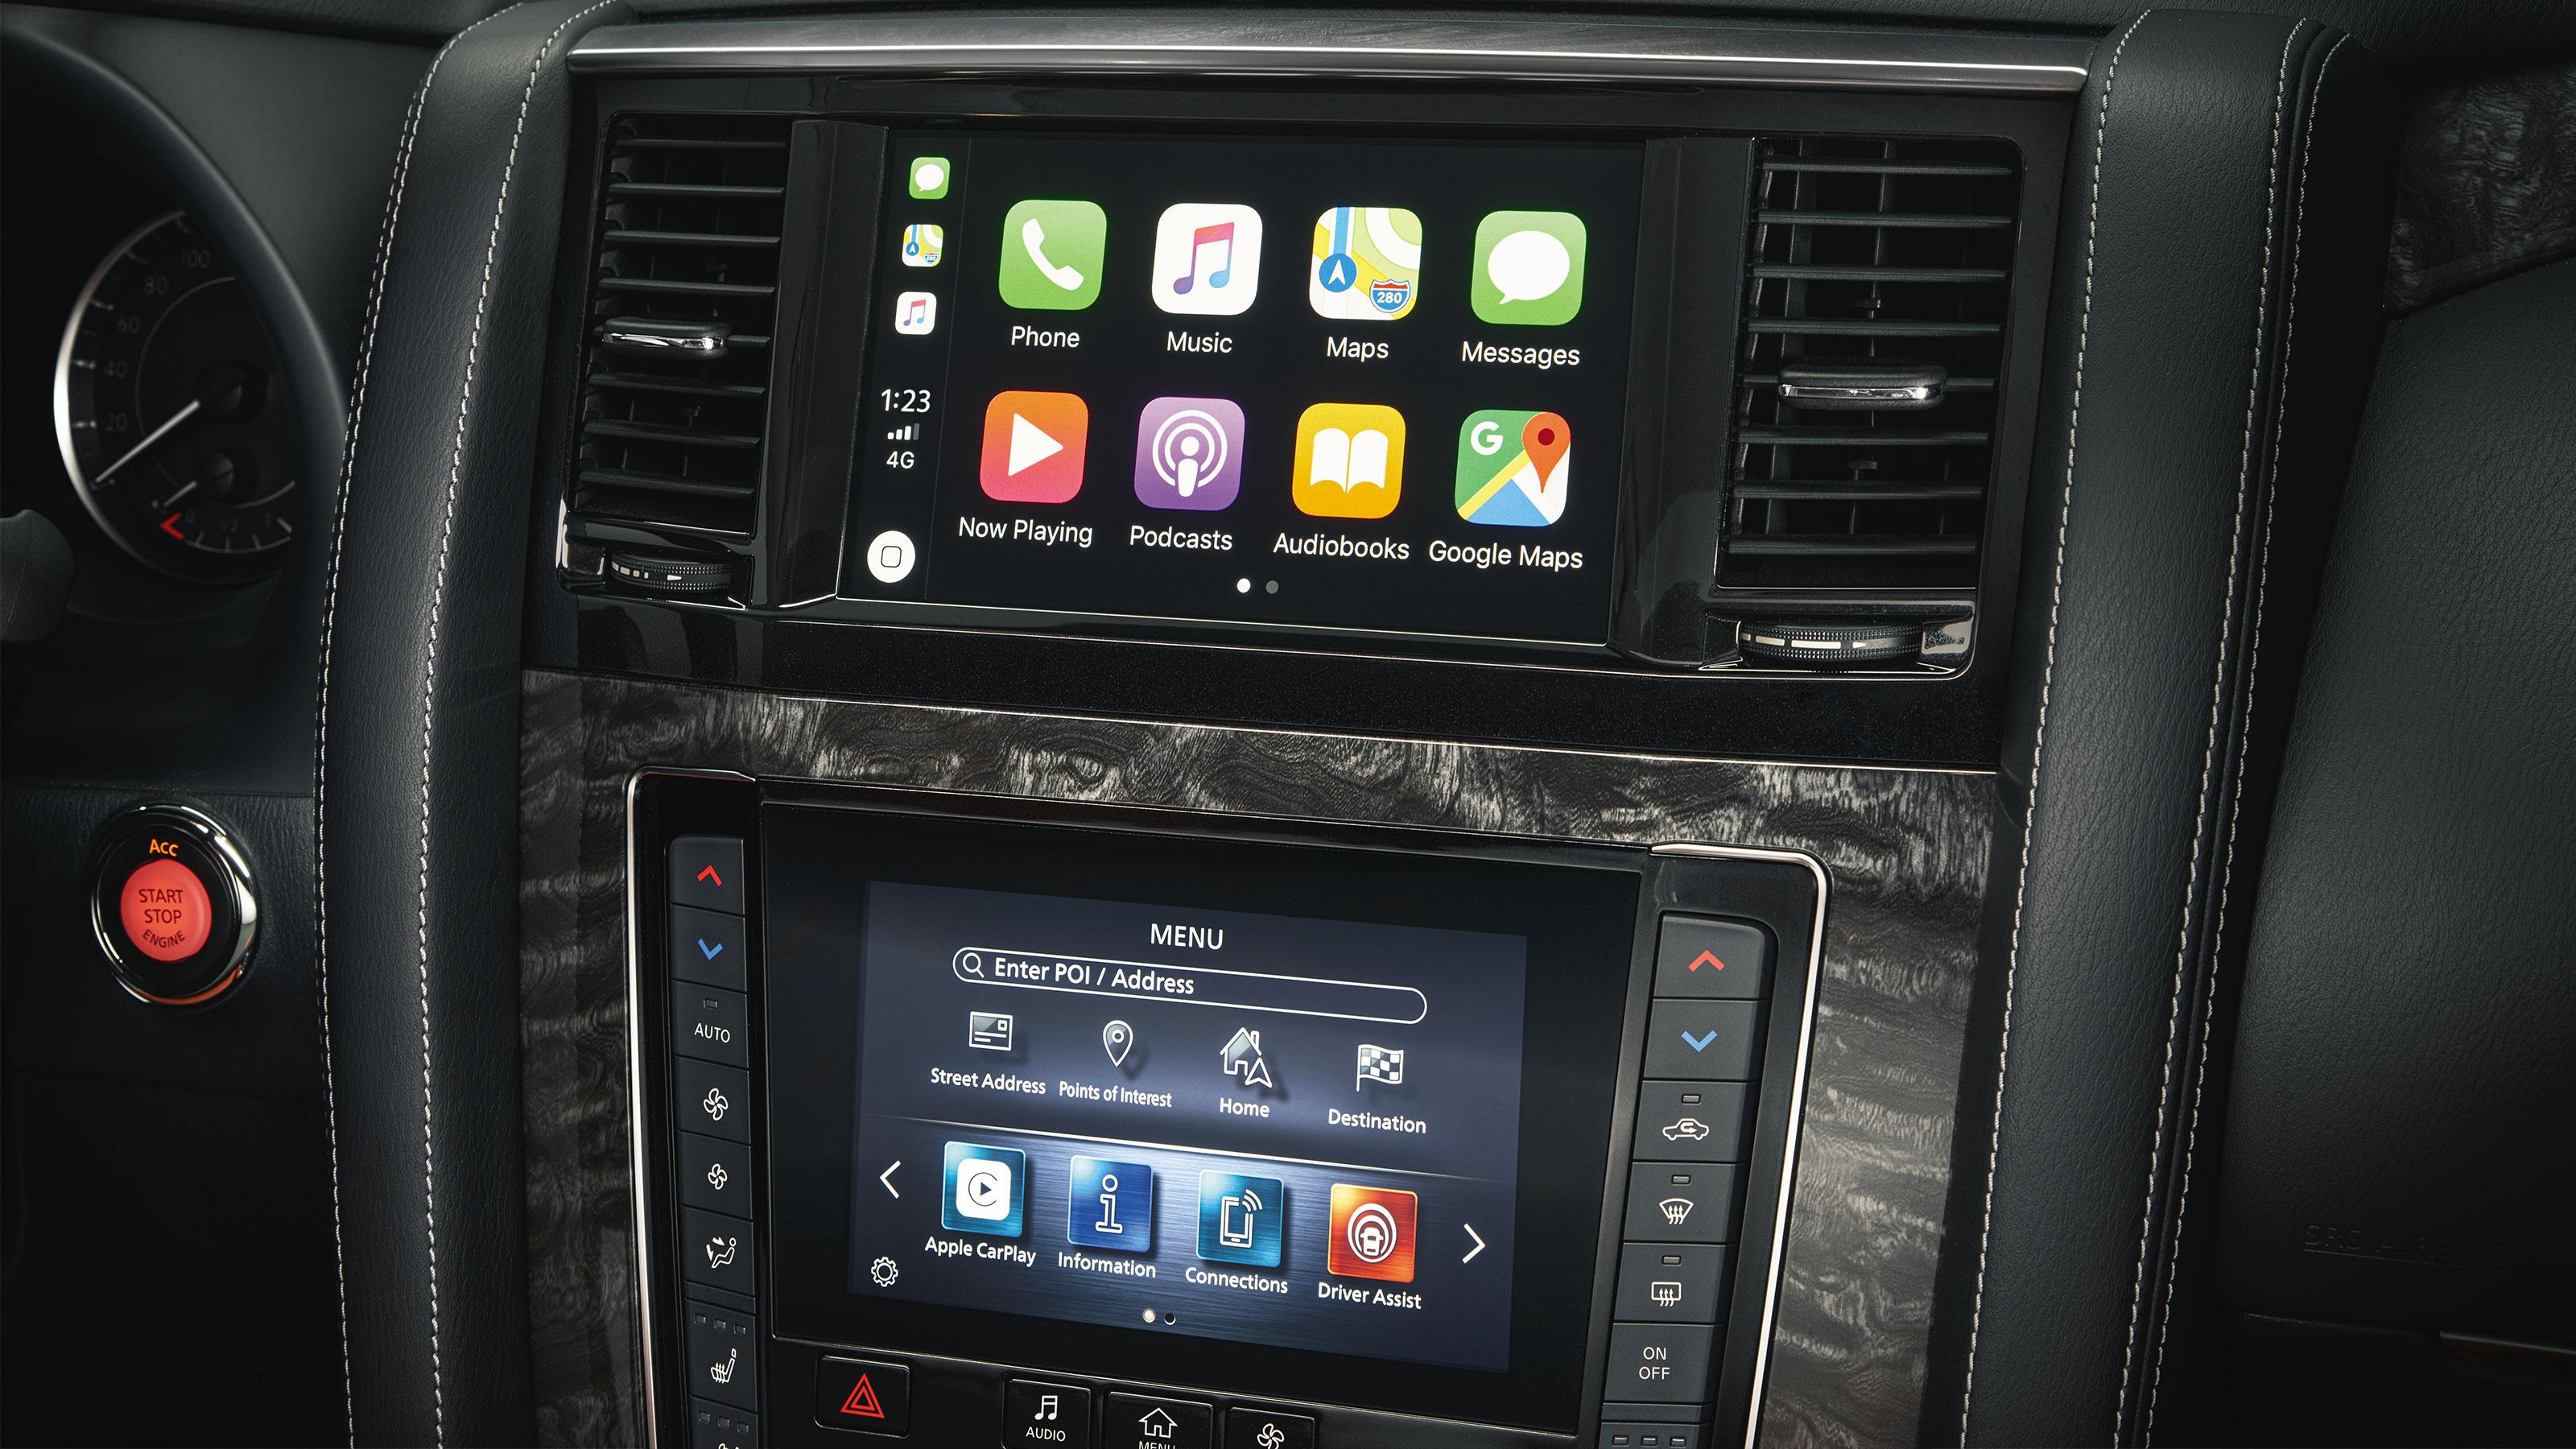 2020 NISSAN PATROL dual HD touchscreens